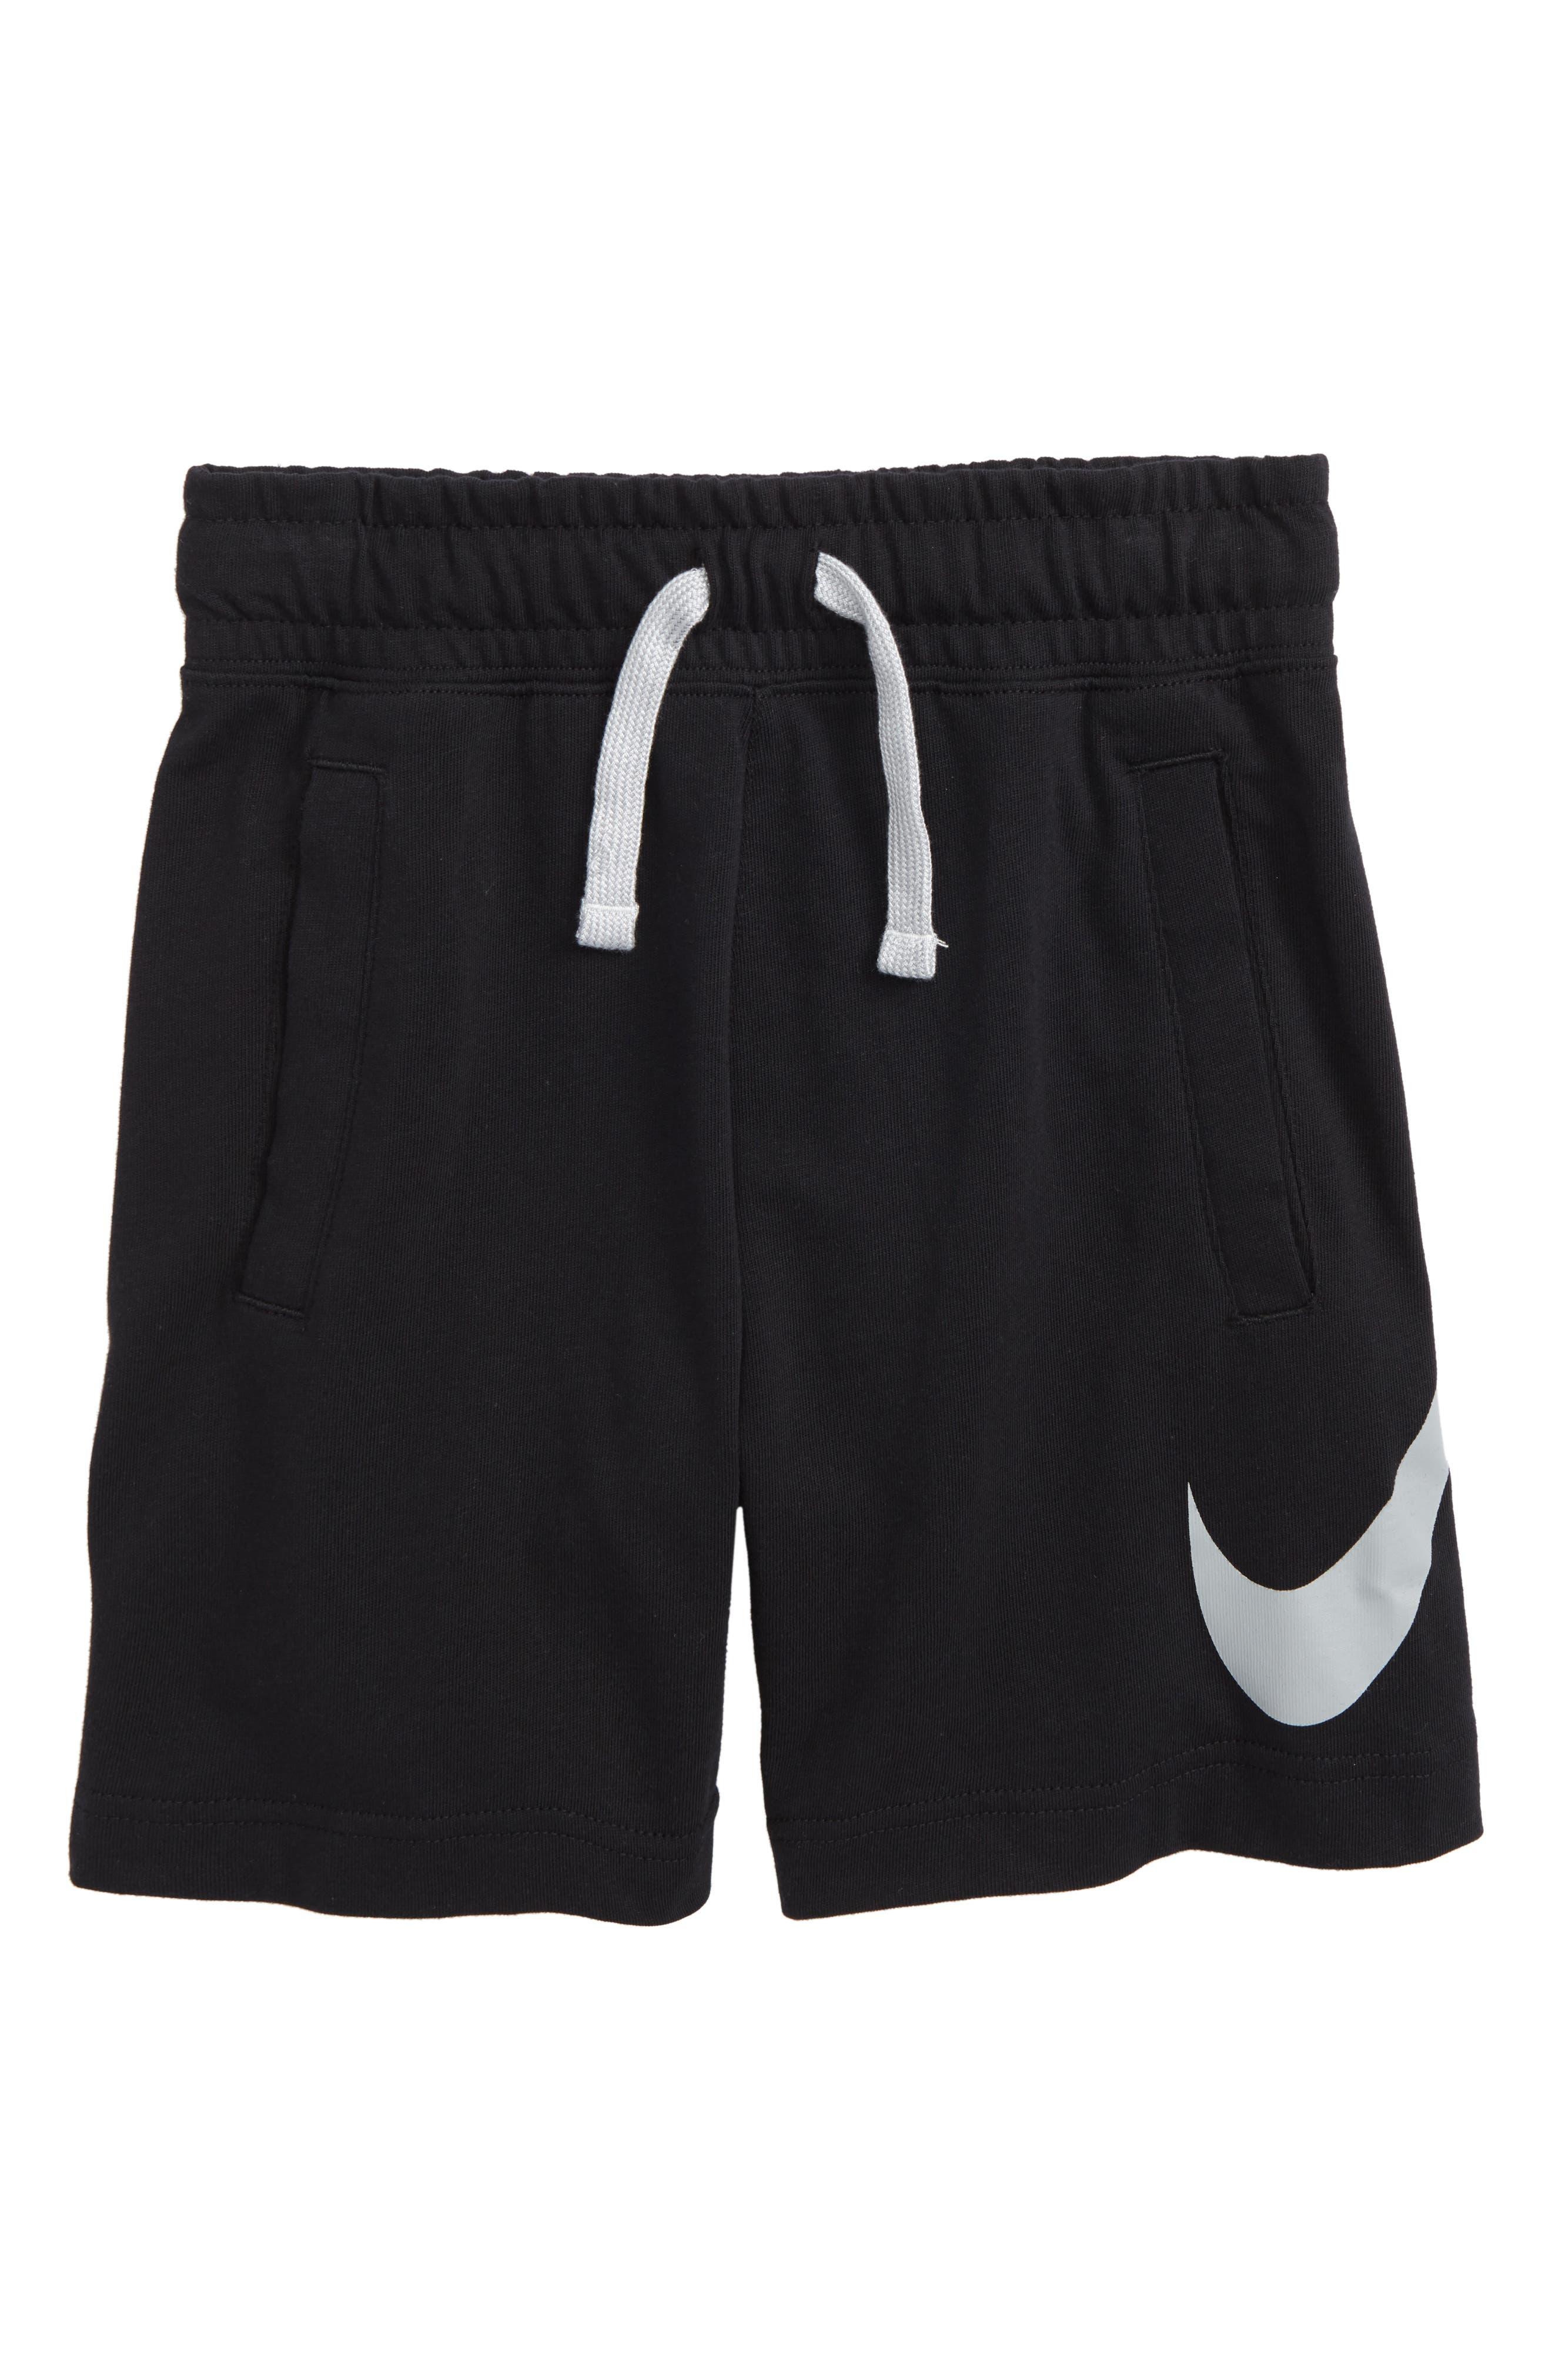 Sportswear Jersey Shorts,                             Main thumbnail 1, color,                             010